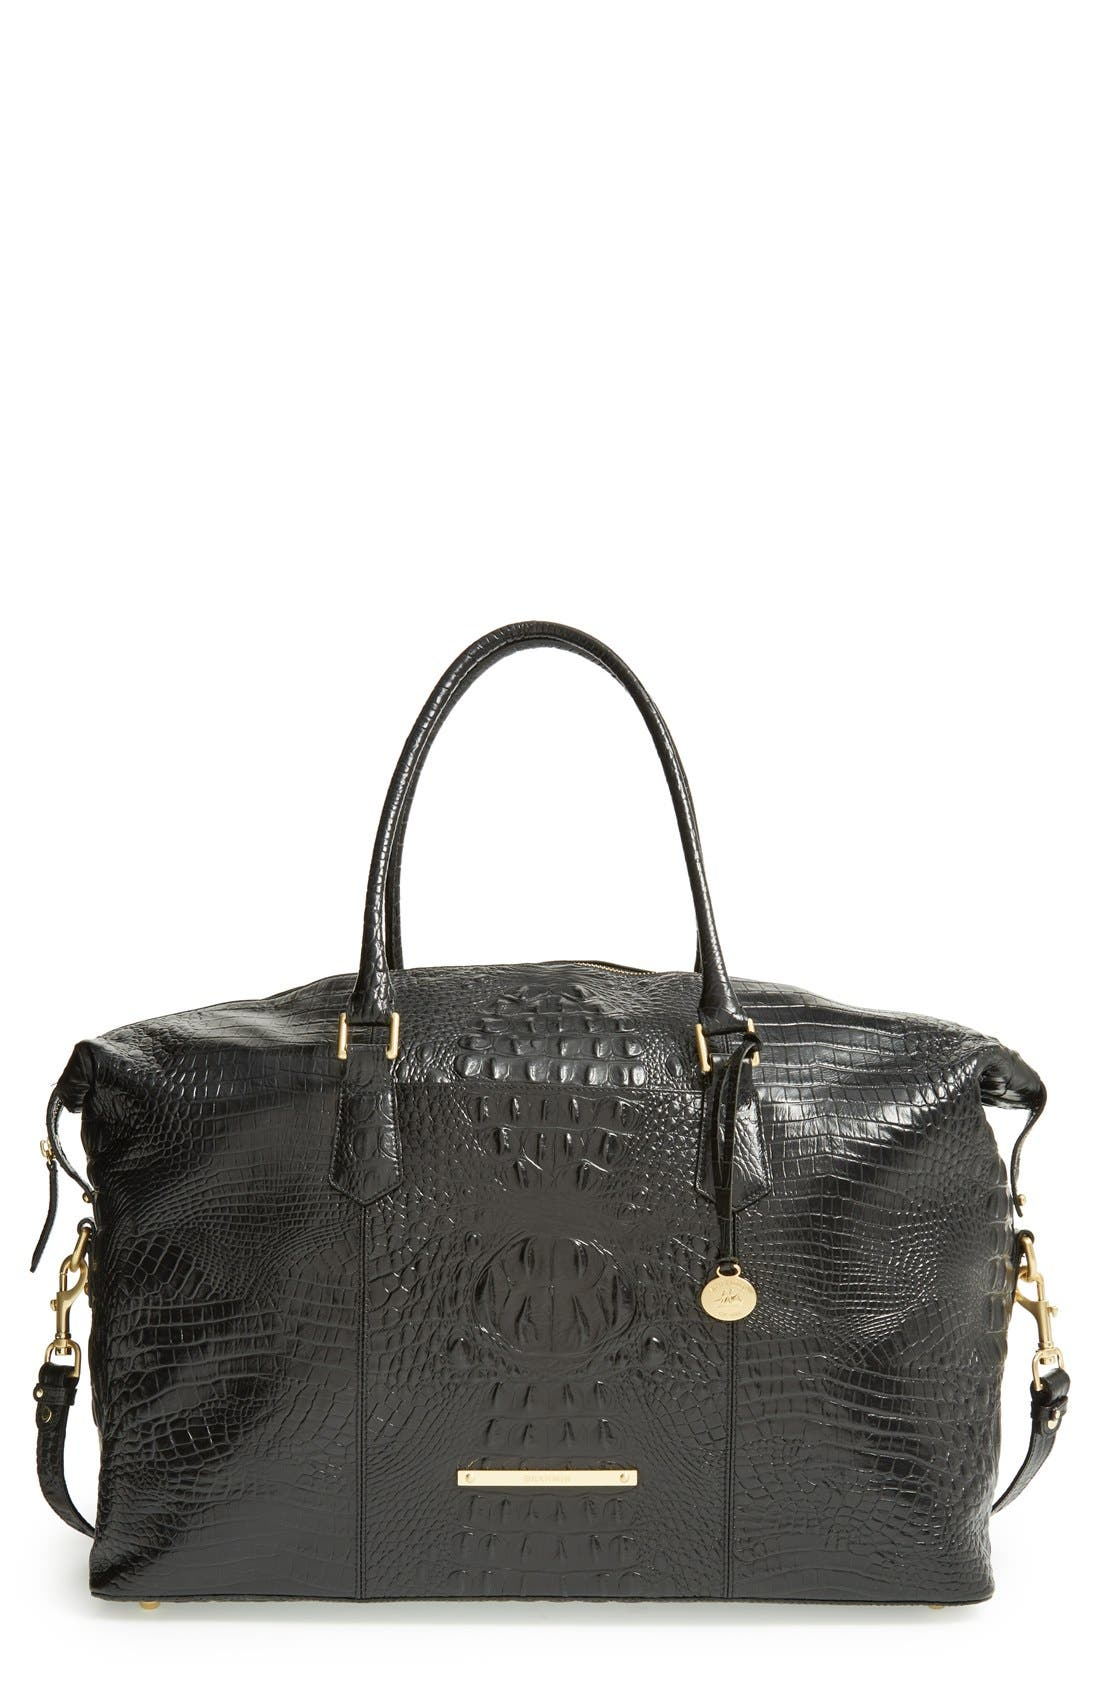 'Duxbury' Leather Travel Bag,                             Main thumbnail 3, color,